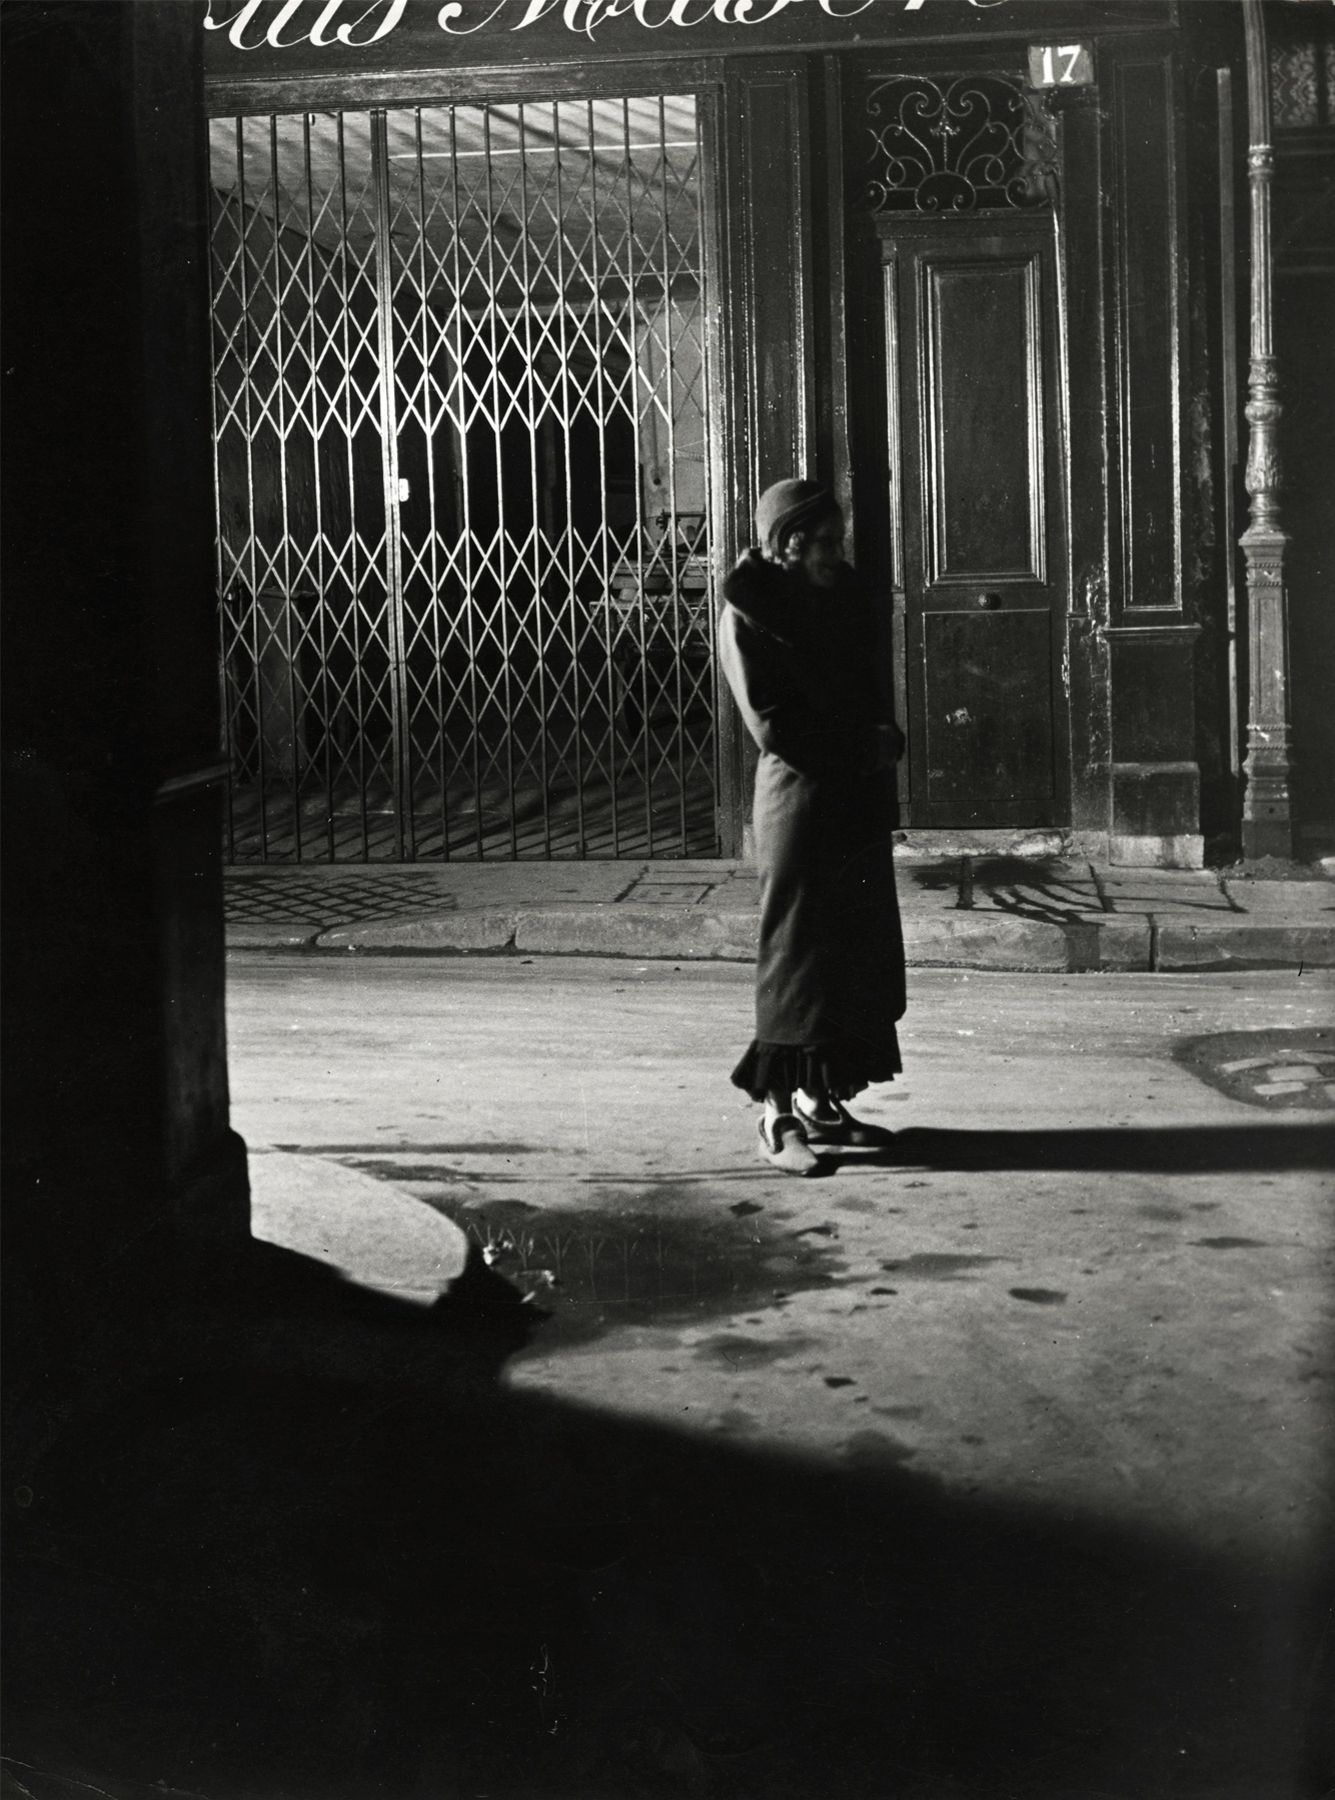 Brassaï - Fille De Joie, Rue Quincampoix, 1931 - Howard Greenberg Gallery